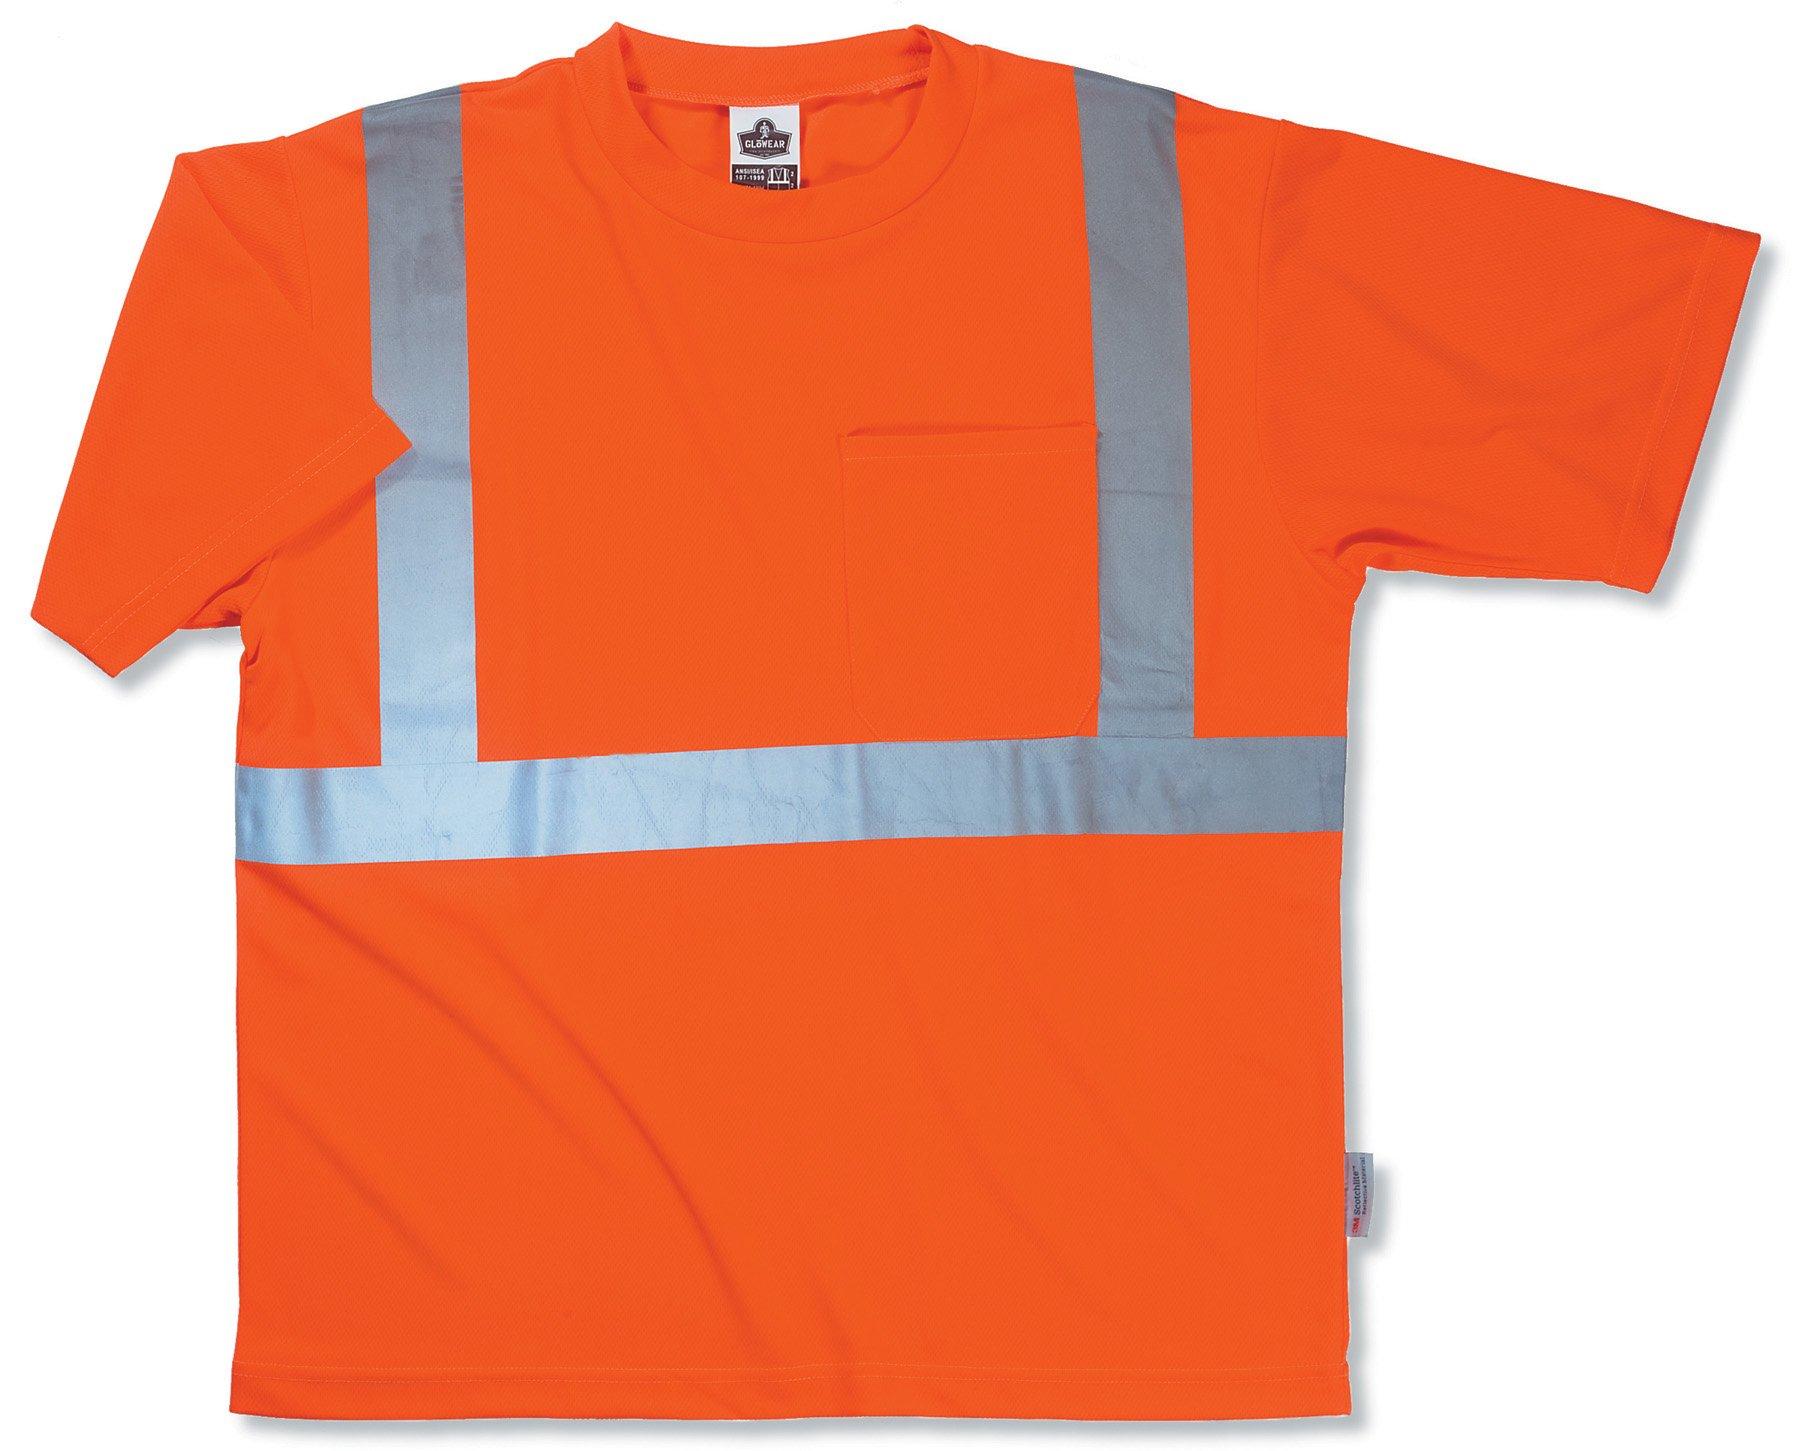 Ergodyne GloWear 8289 ANSI High Visibility Orange Reflective T-Shirt, 2XL